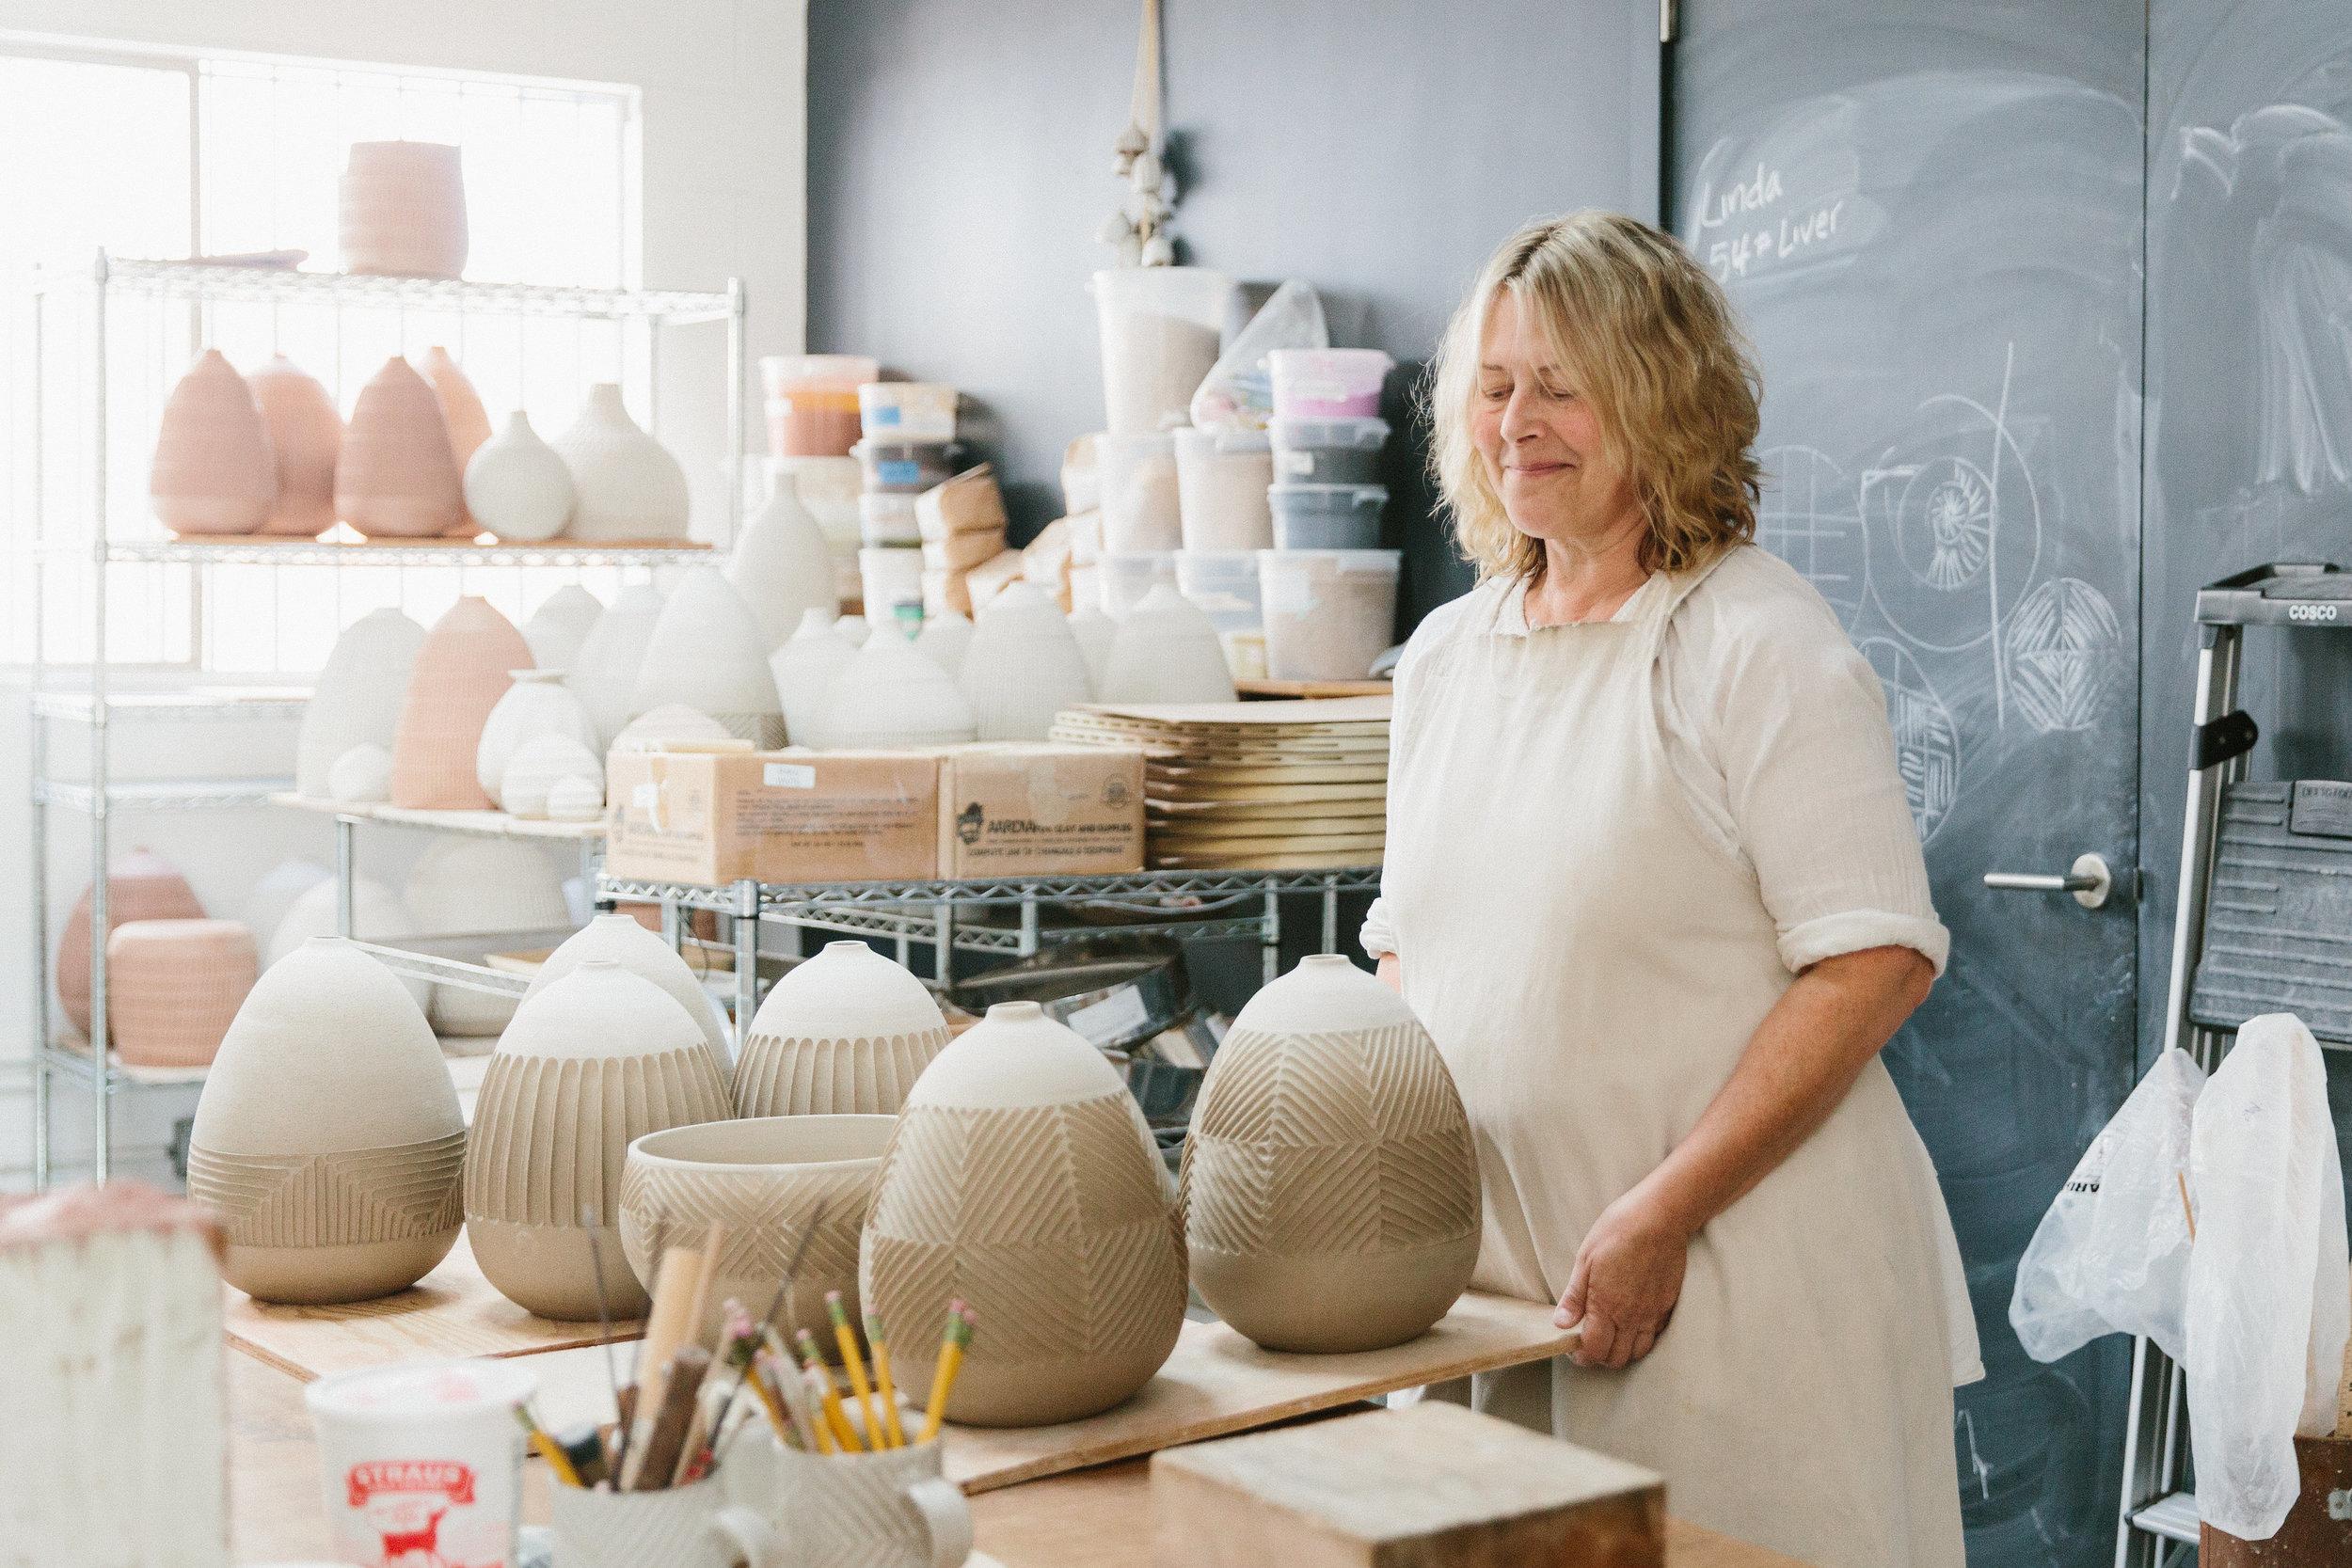 mt-washington-pottery_jenni-kayne_nicki-sebastian-photography-58.jpg